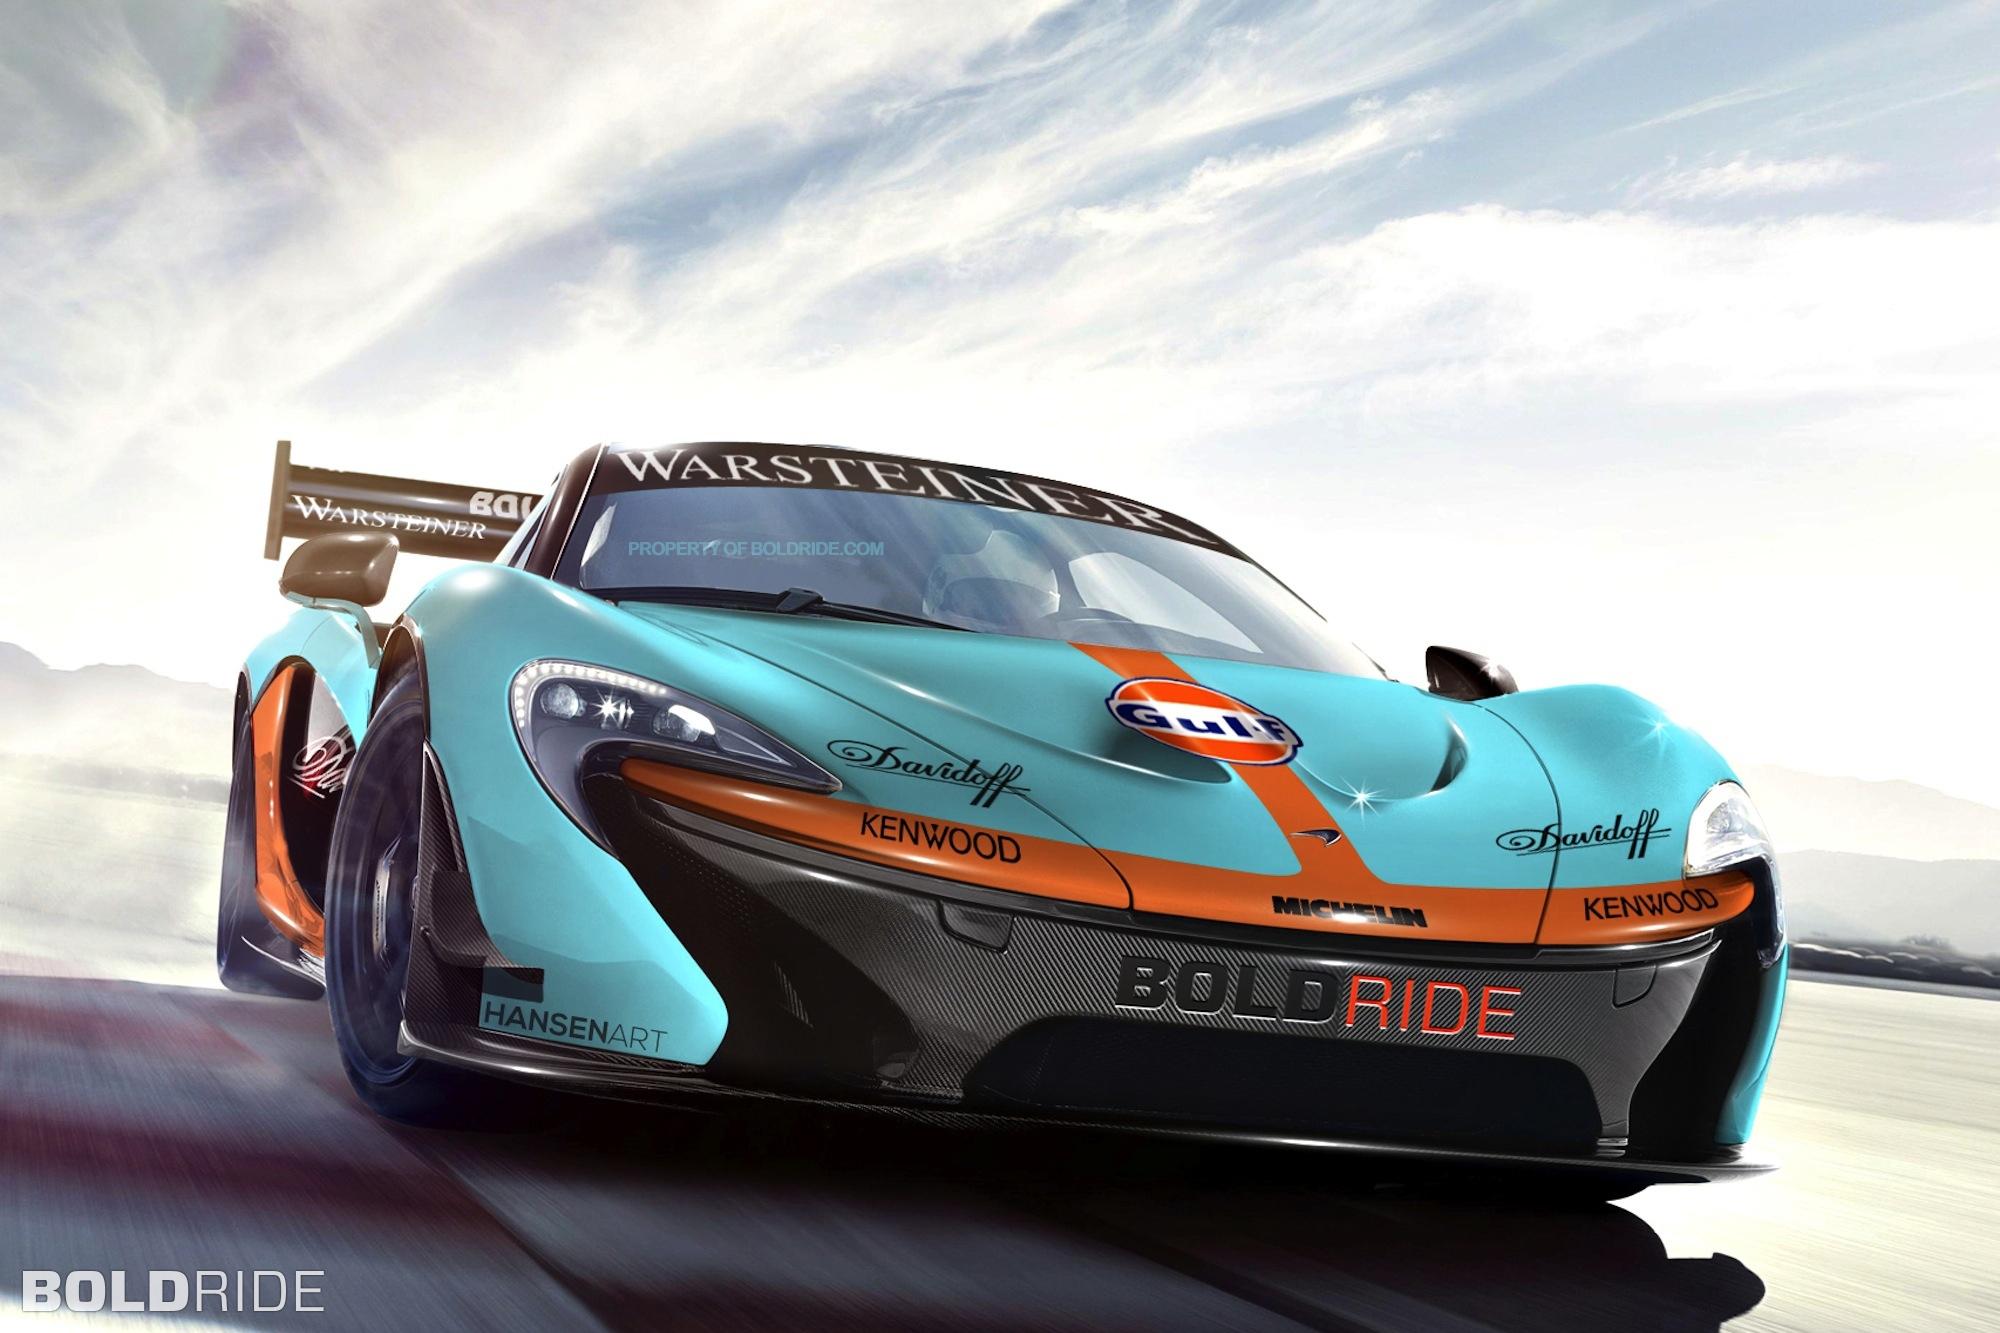 http://images.caradisiac.com/images/5/4/3/9/85439/S0-McLaren-P1-GTR-Gulf-vs-LaFerrari-EVOXX-dans-vos-reves-289153.jpg